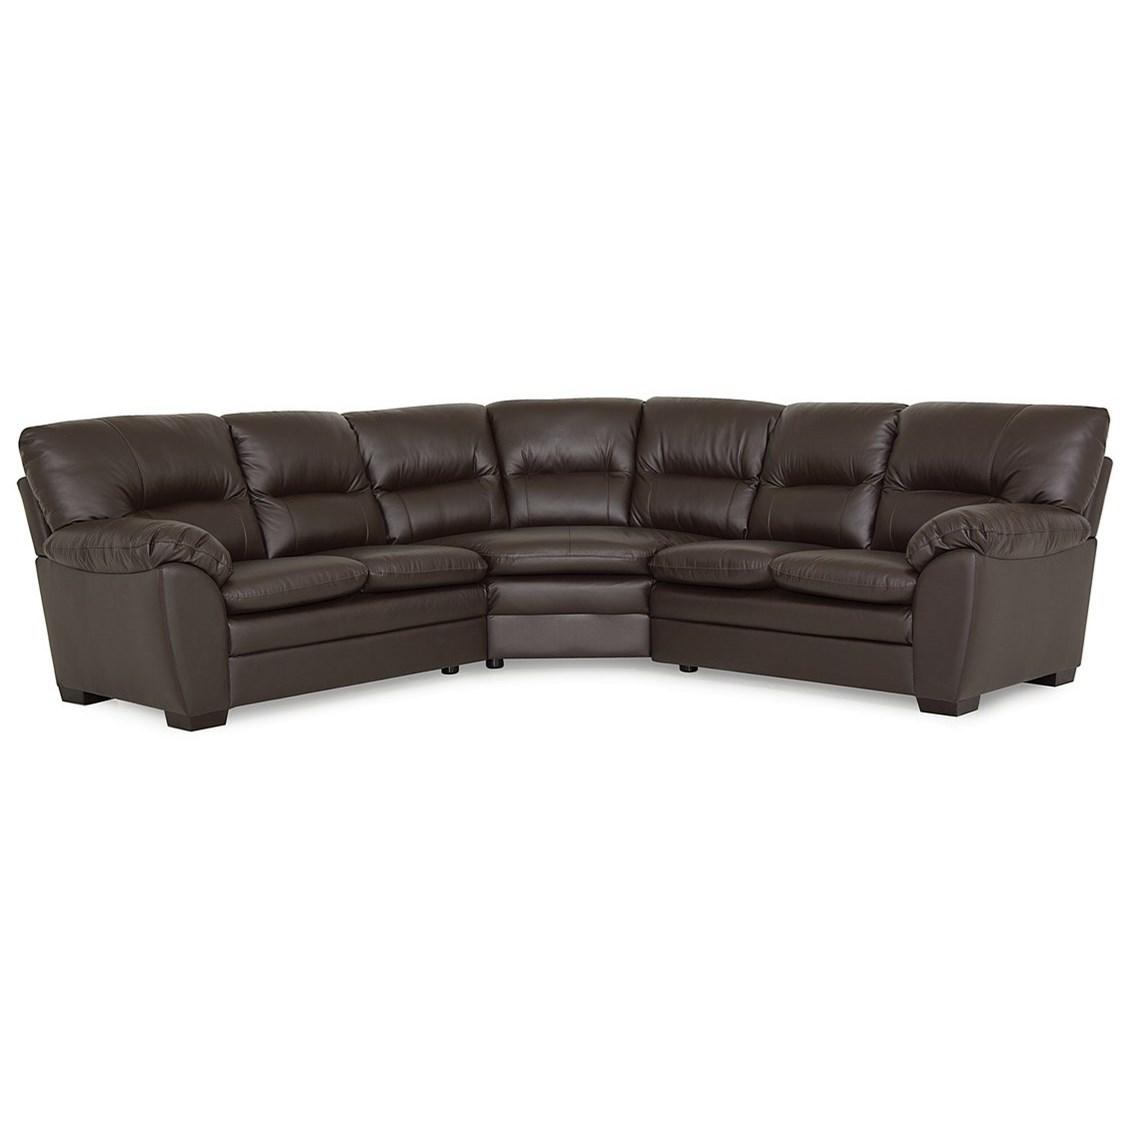 Amisk Sectional  by Palliser at A1 Furniture & Mattress